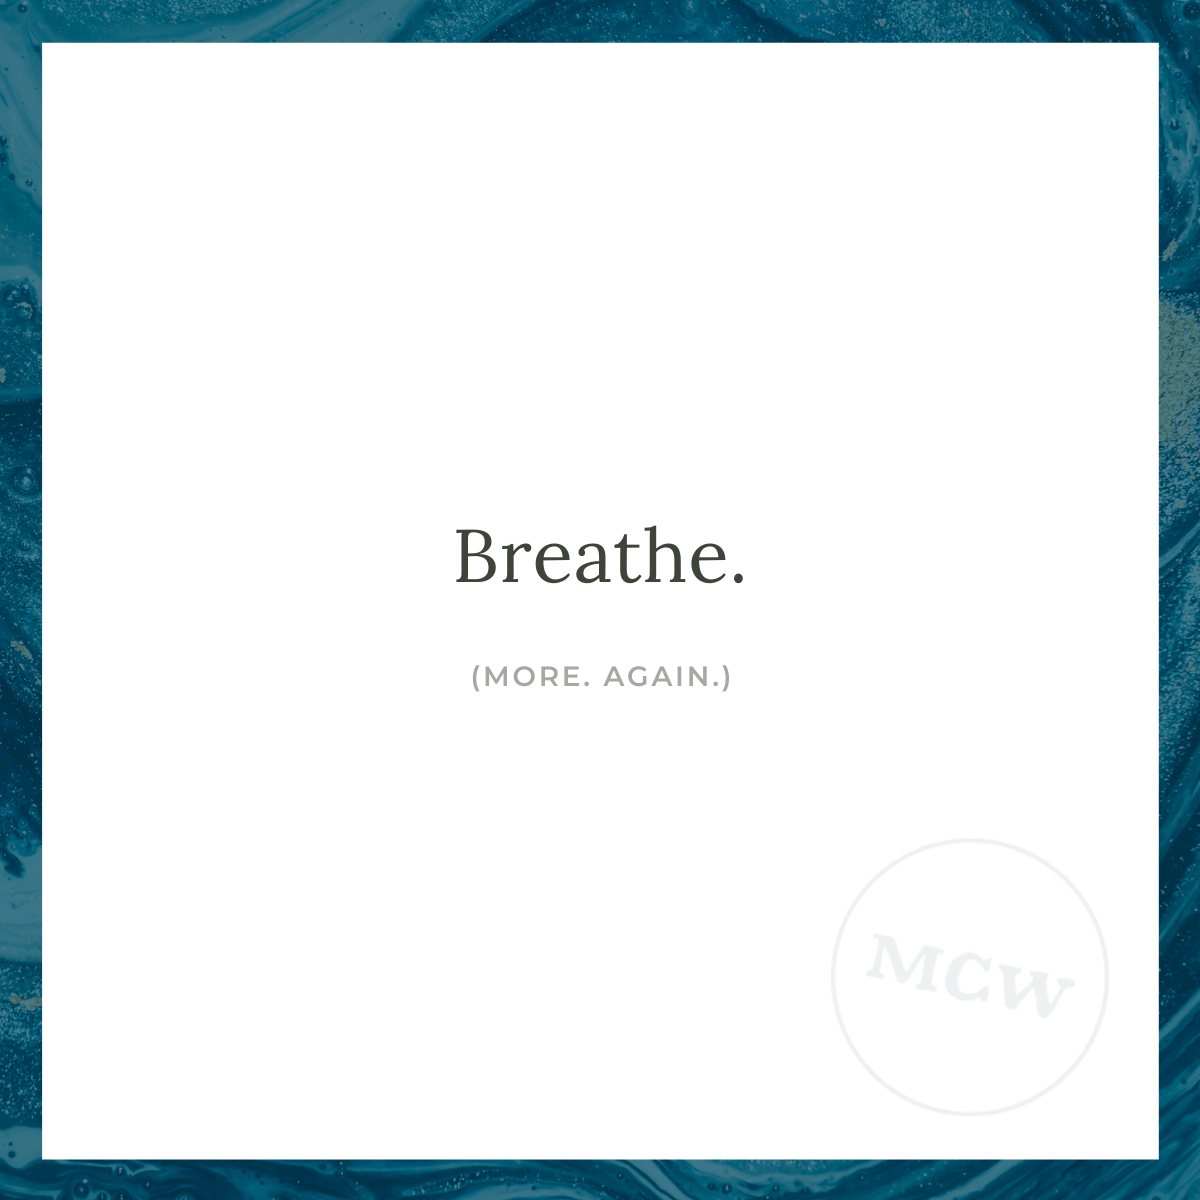 Breathe. (More. Again.) - 3 Things that help when I'm feeling anxious